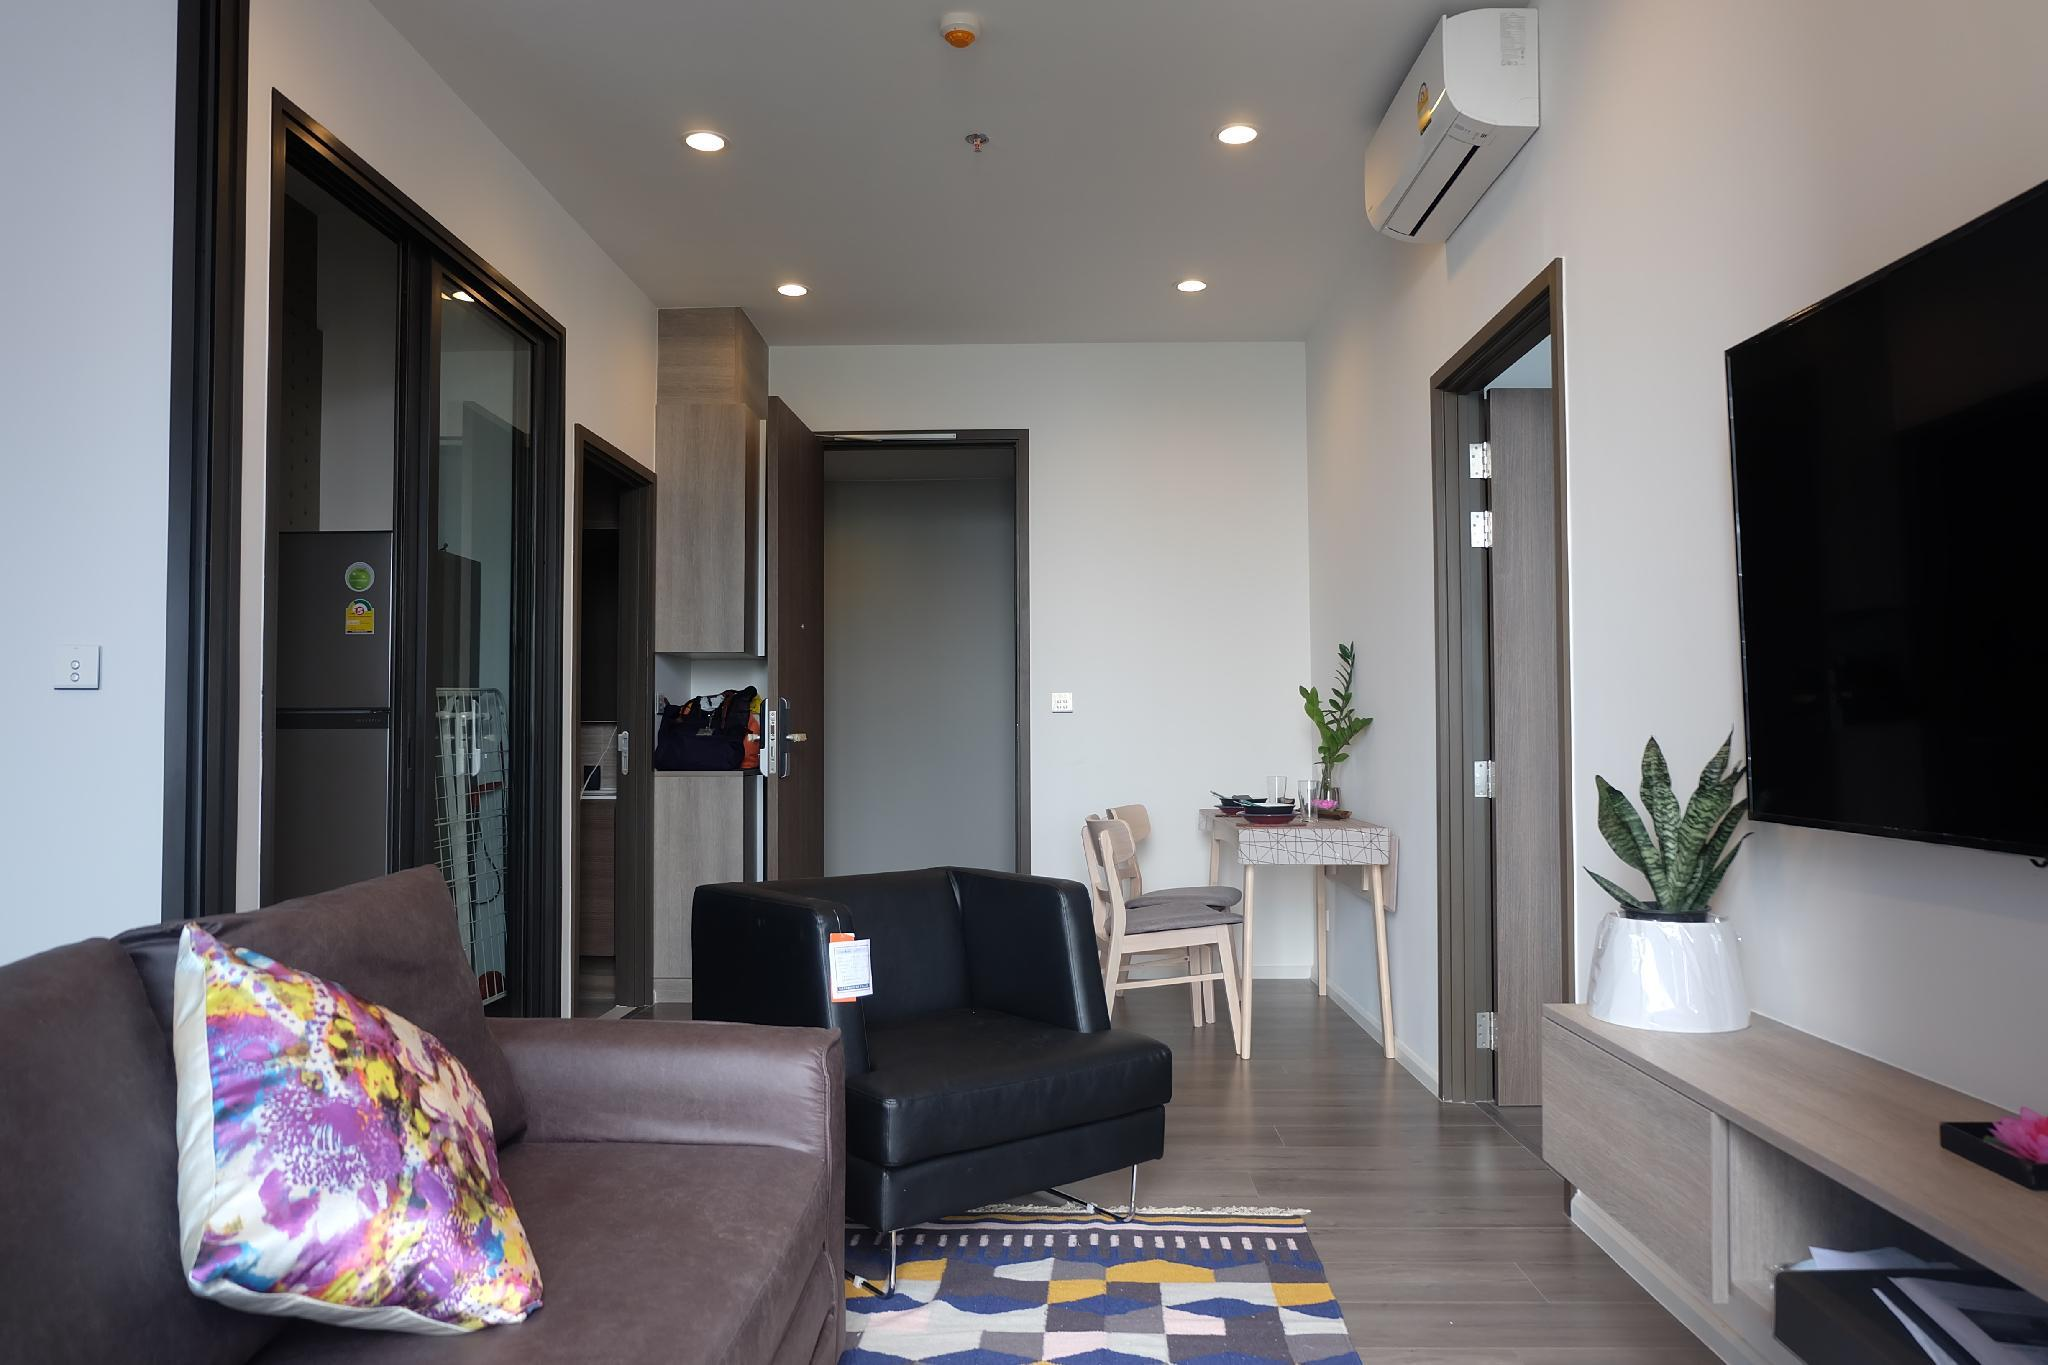 New Room*nourish Mindandsoul In GreenandLifestyle Mall